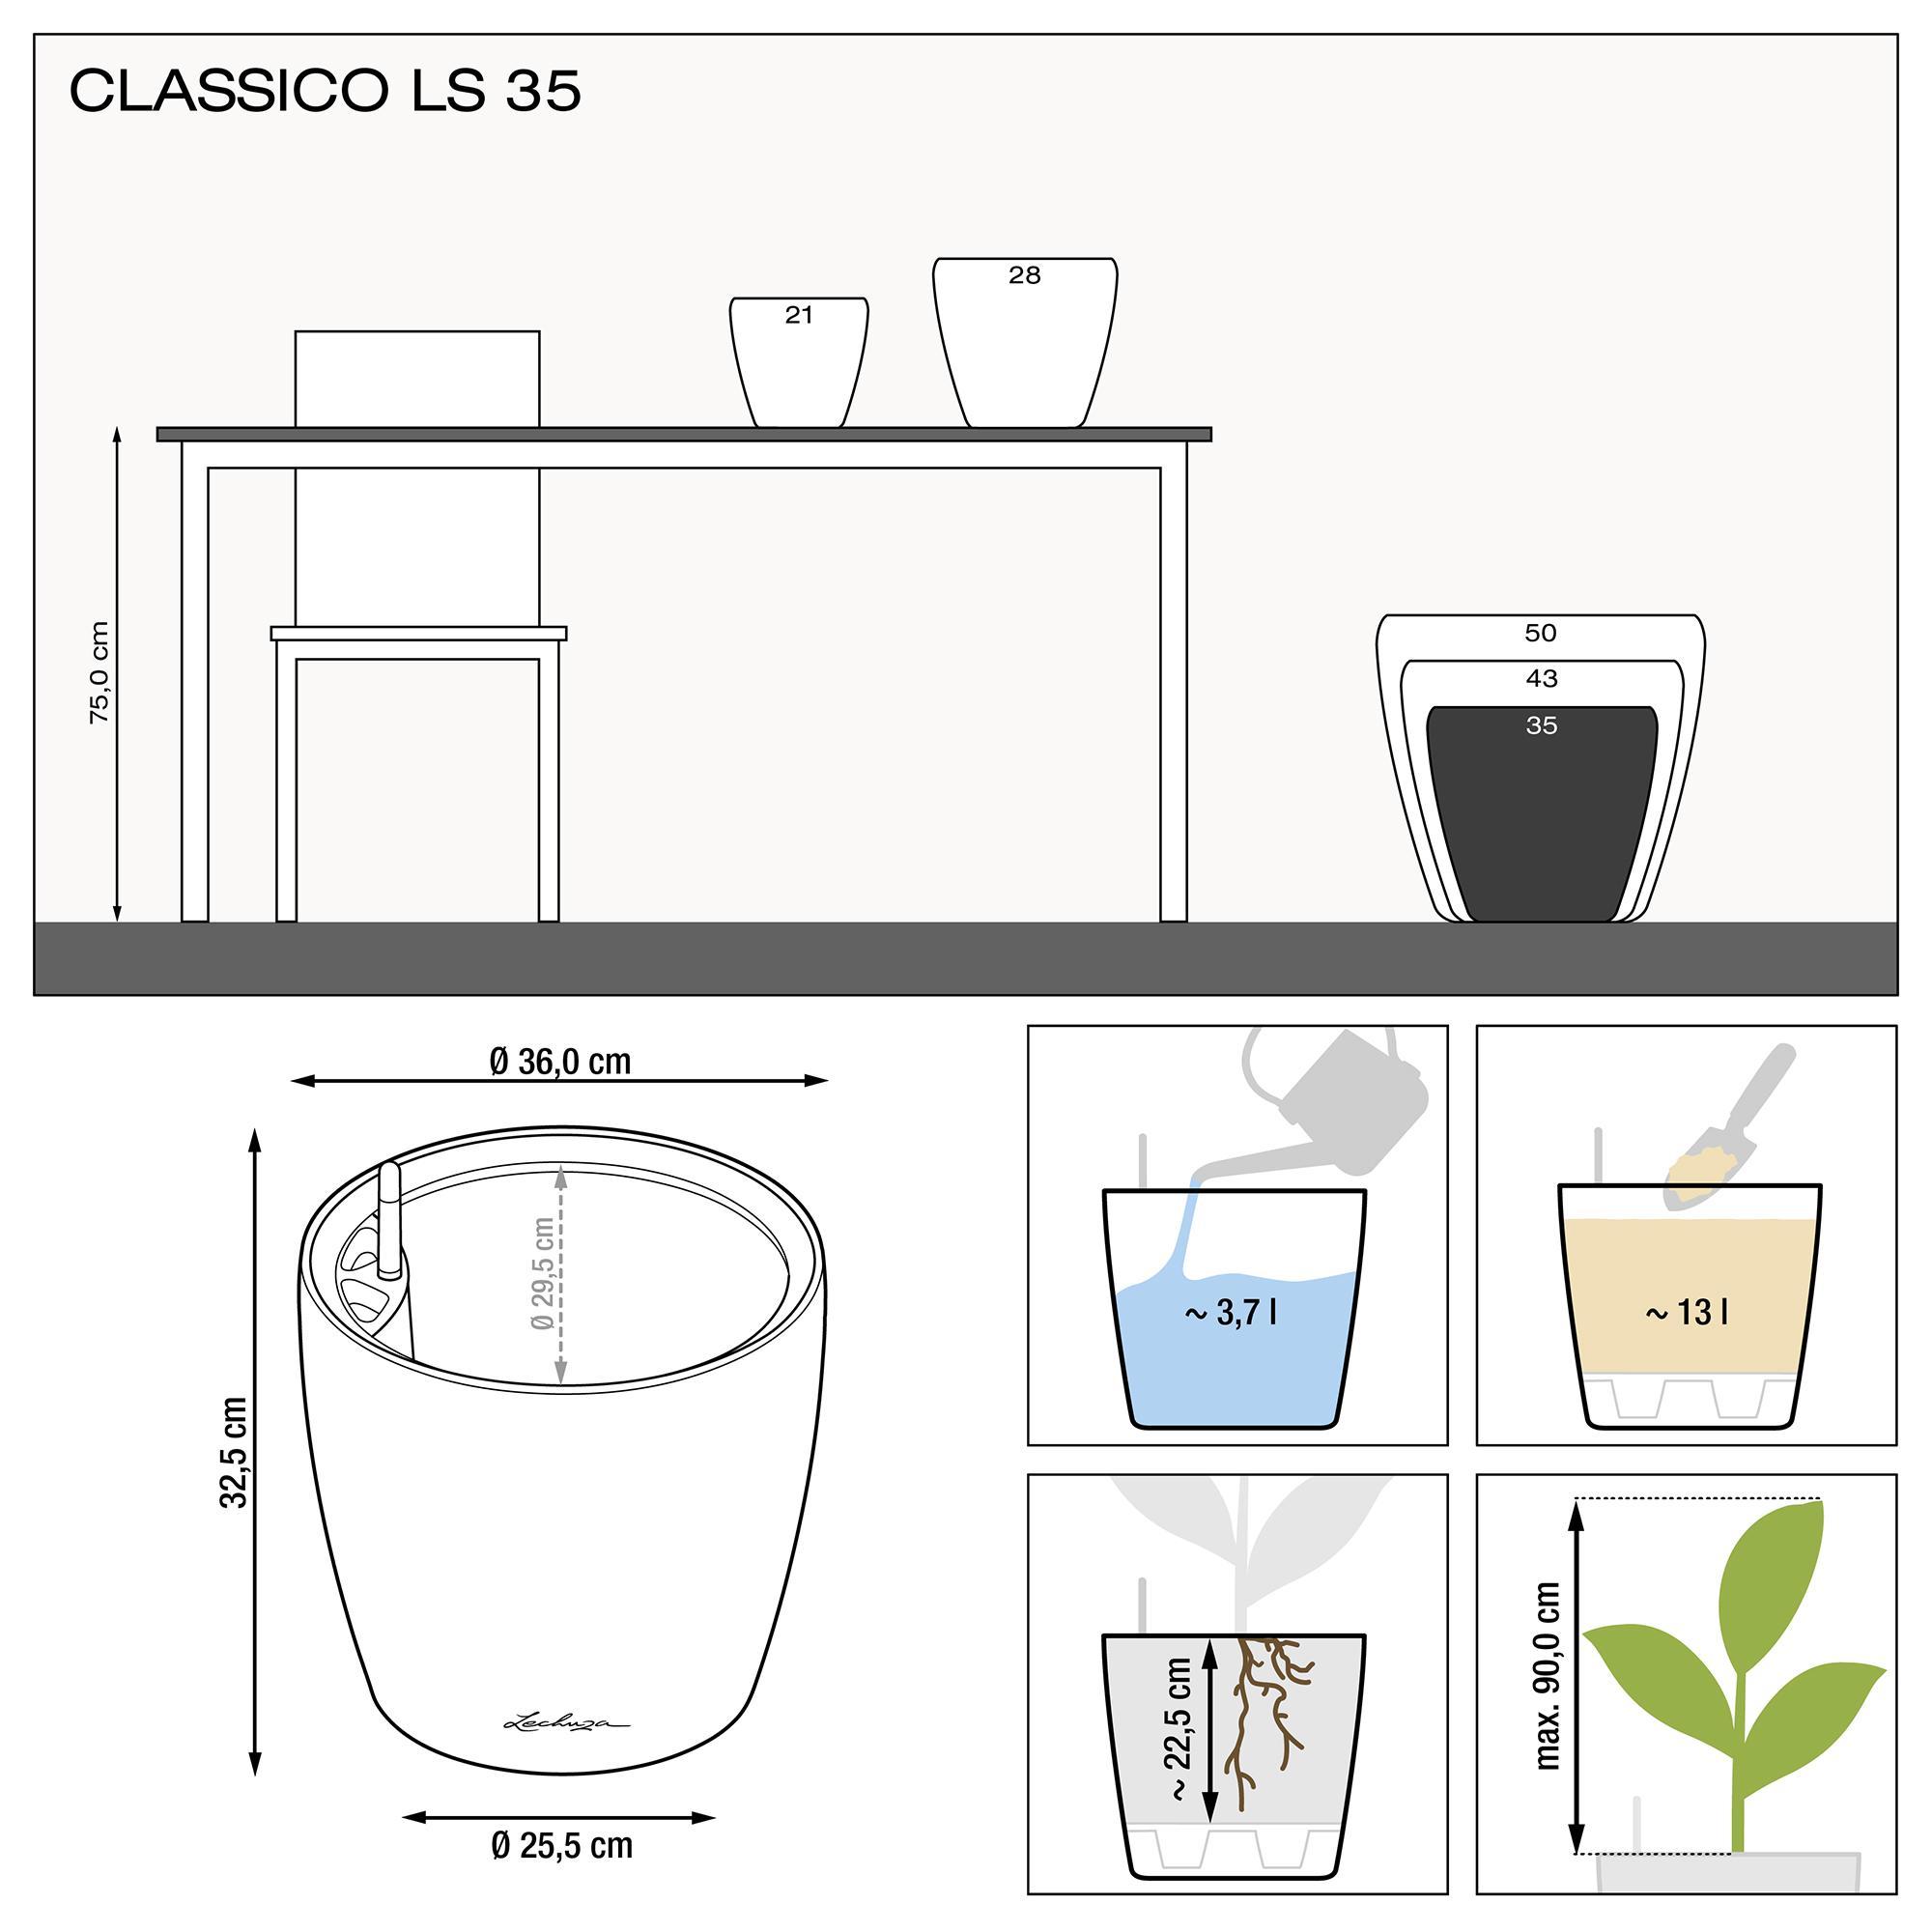 CLASSICO LS 35 shiny taupe - Image 3